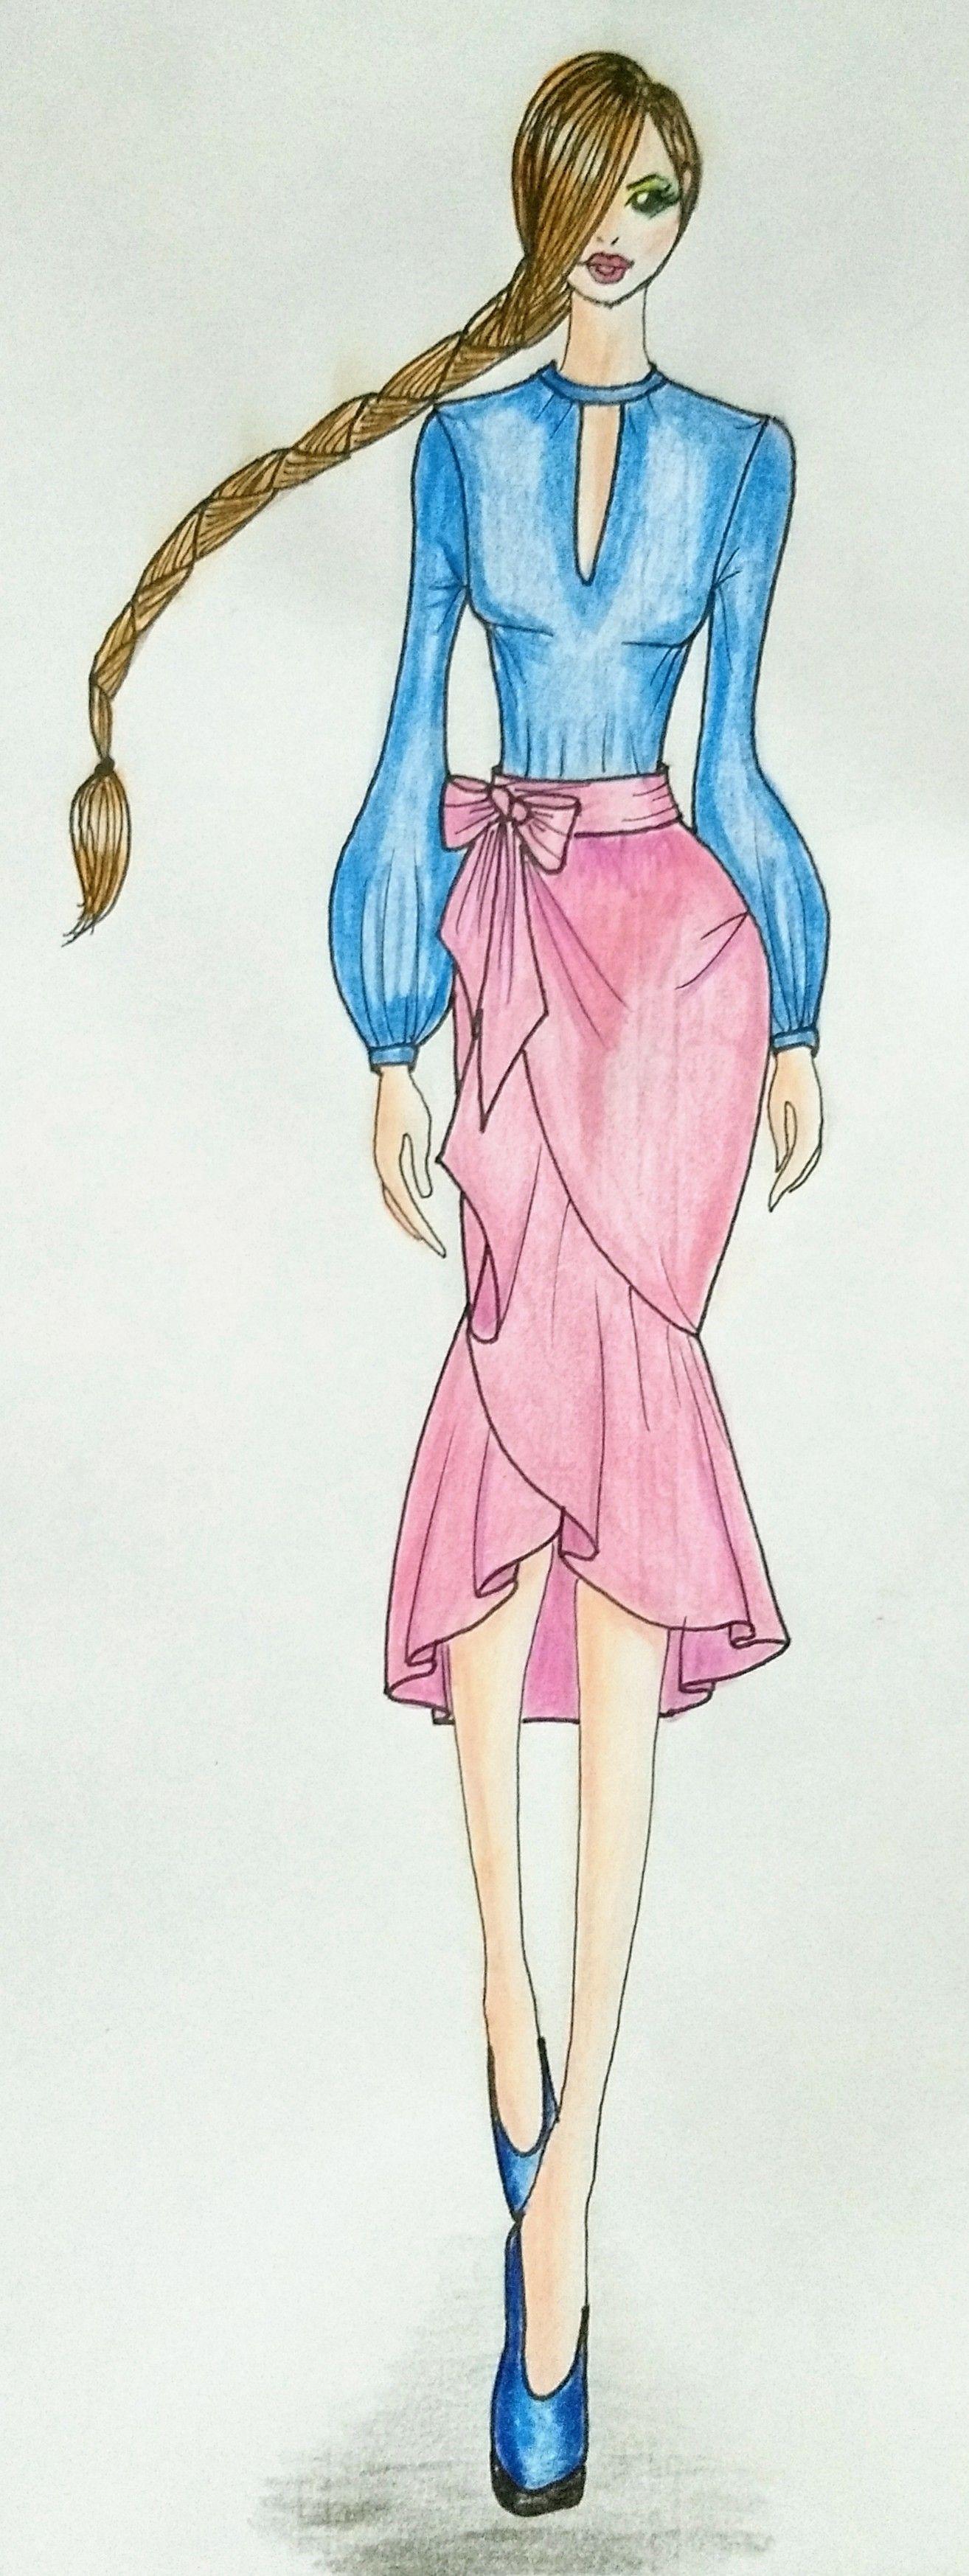 Figurín femenino, blusa manga larga bombacha y falda envolvente tipo ...